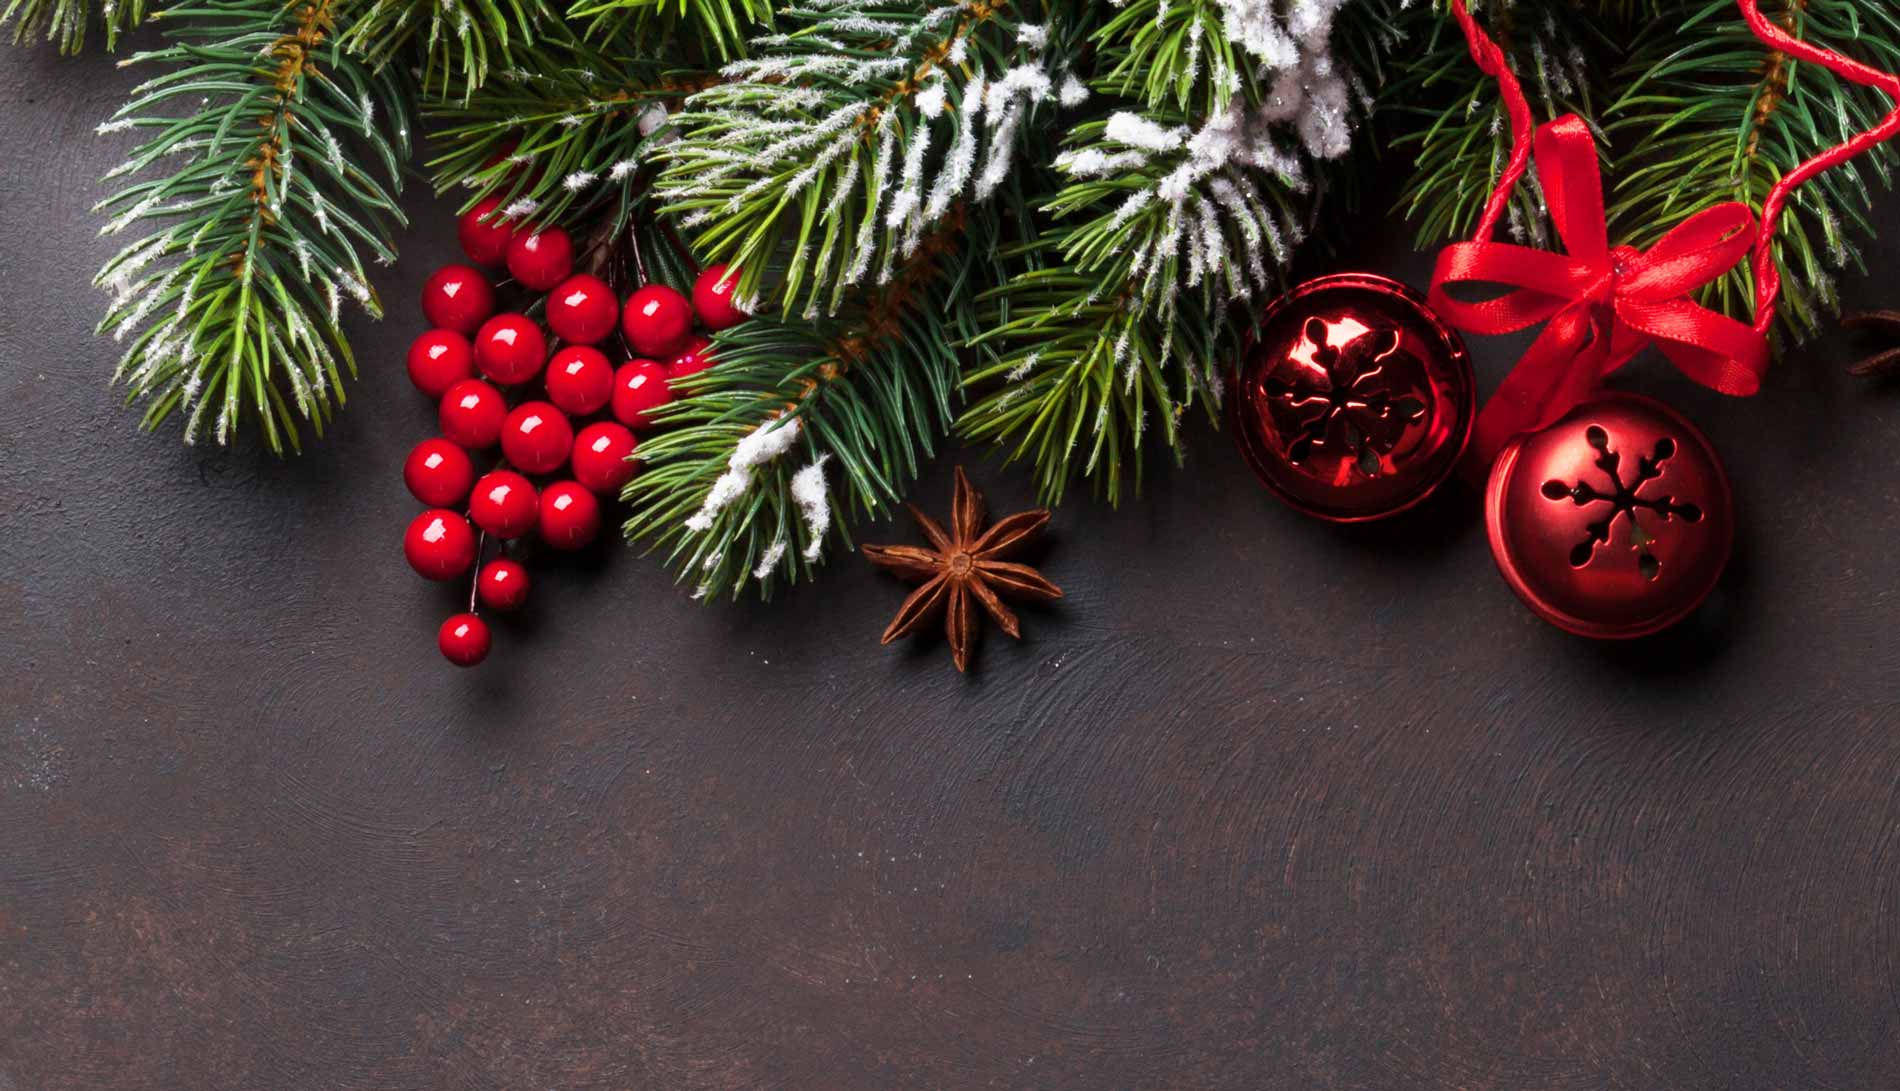 Christmas-at-Powerhouse-v2